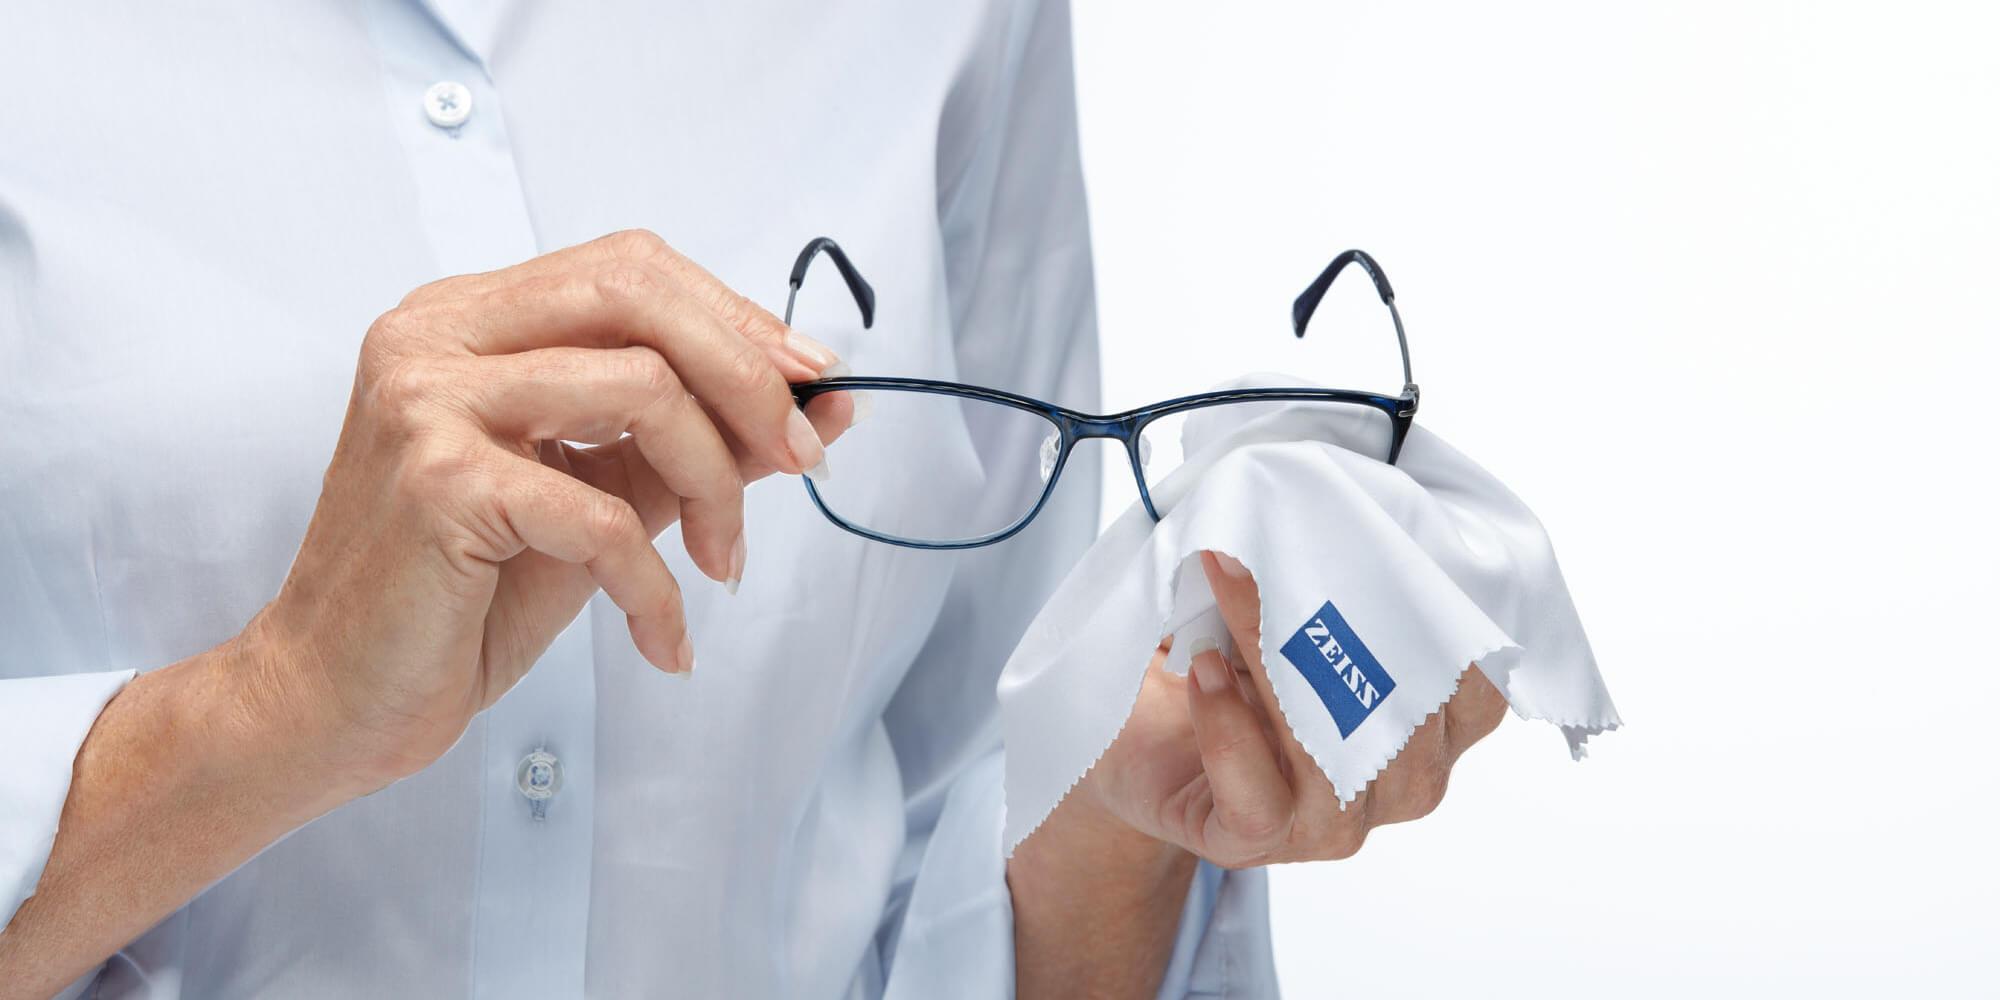 a4d8ed91ae6b0 How should I take care of my prescription eyeglass lenses